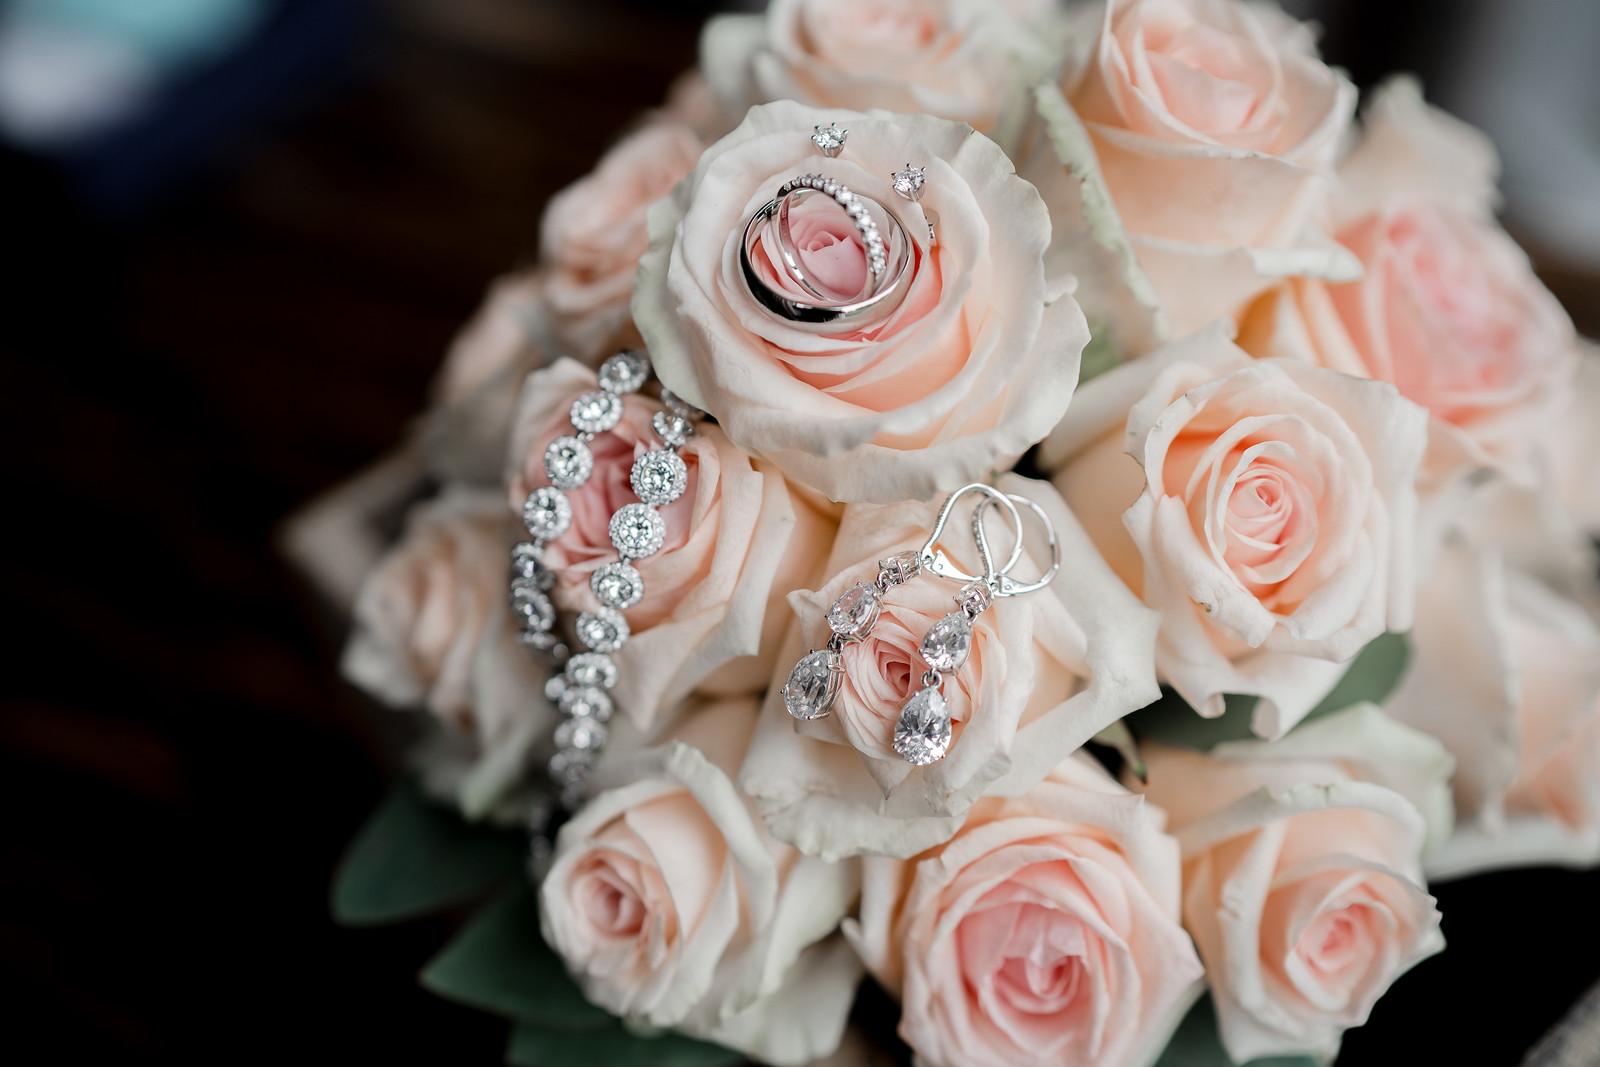 Brides wedding flowers and jewellery